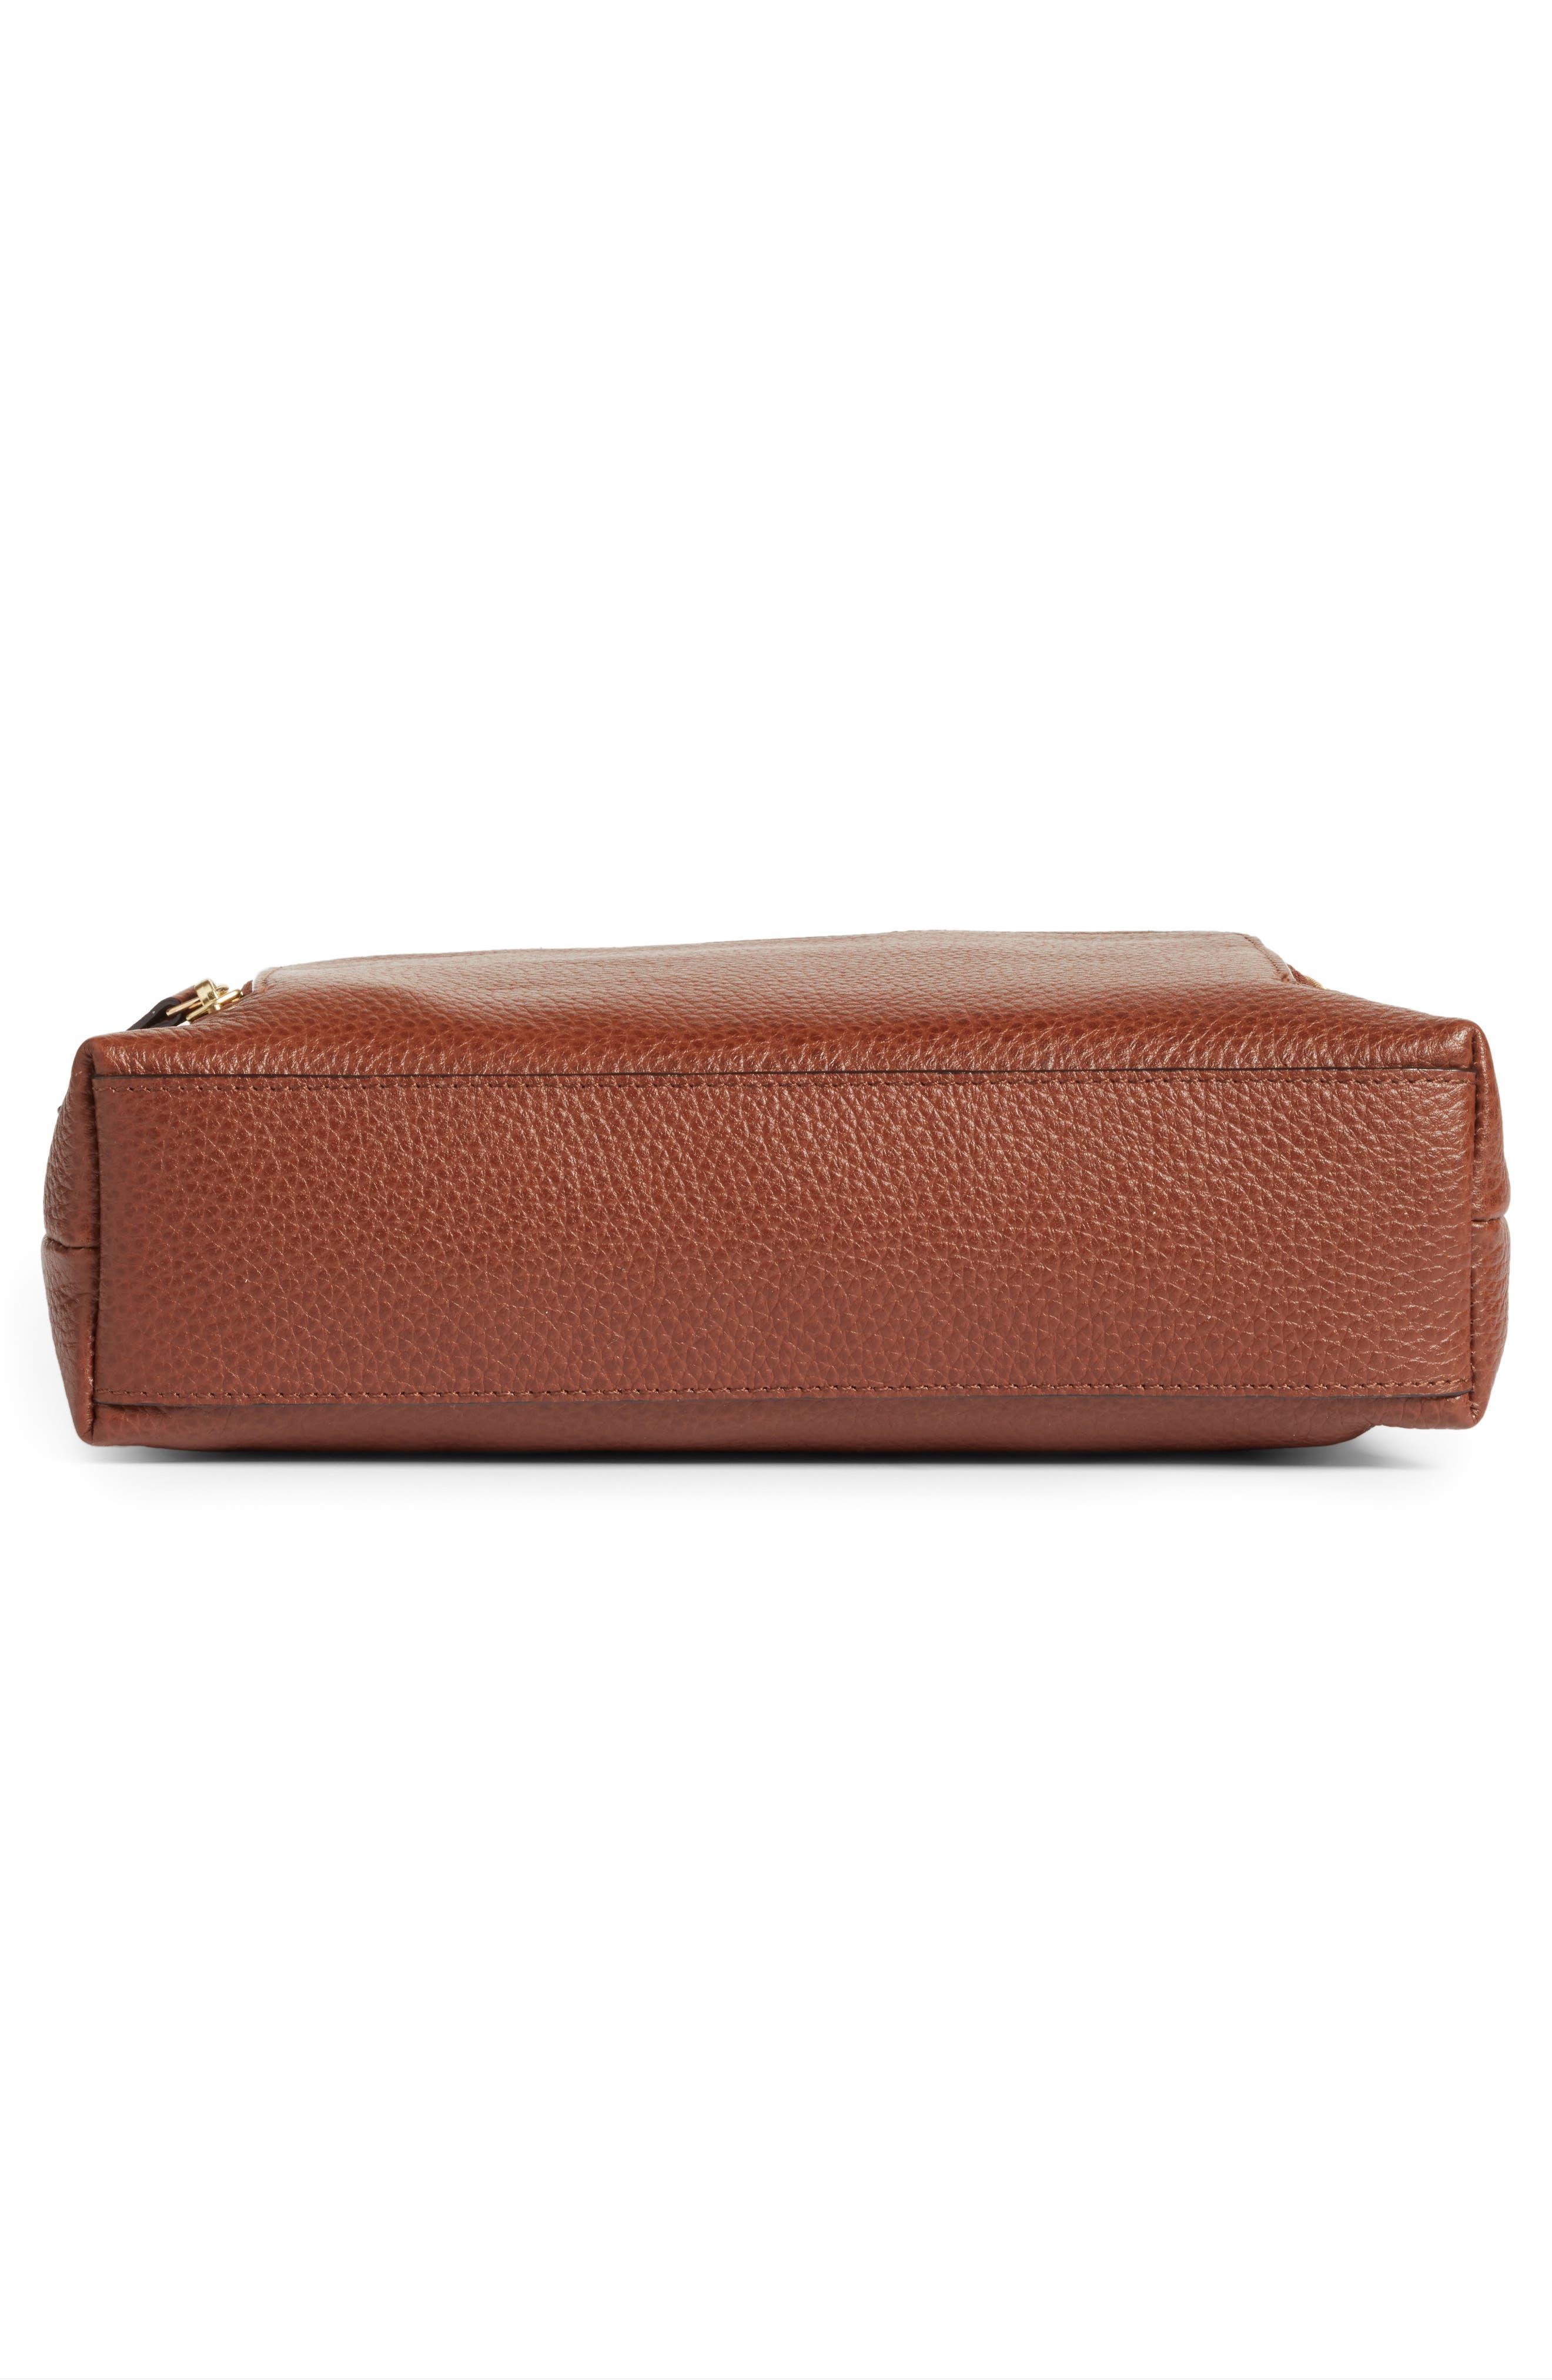 Pebbled Leather Crossbody Bag,                             Alternate thumbnail 23, color,